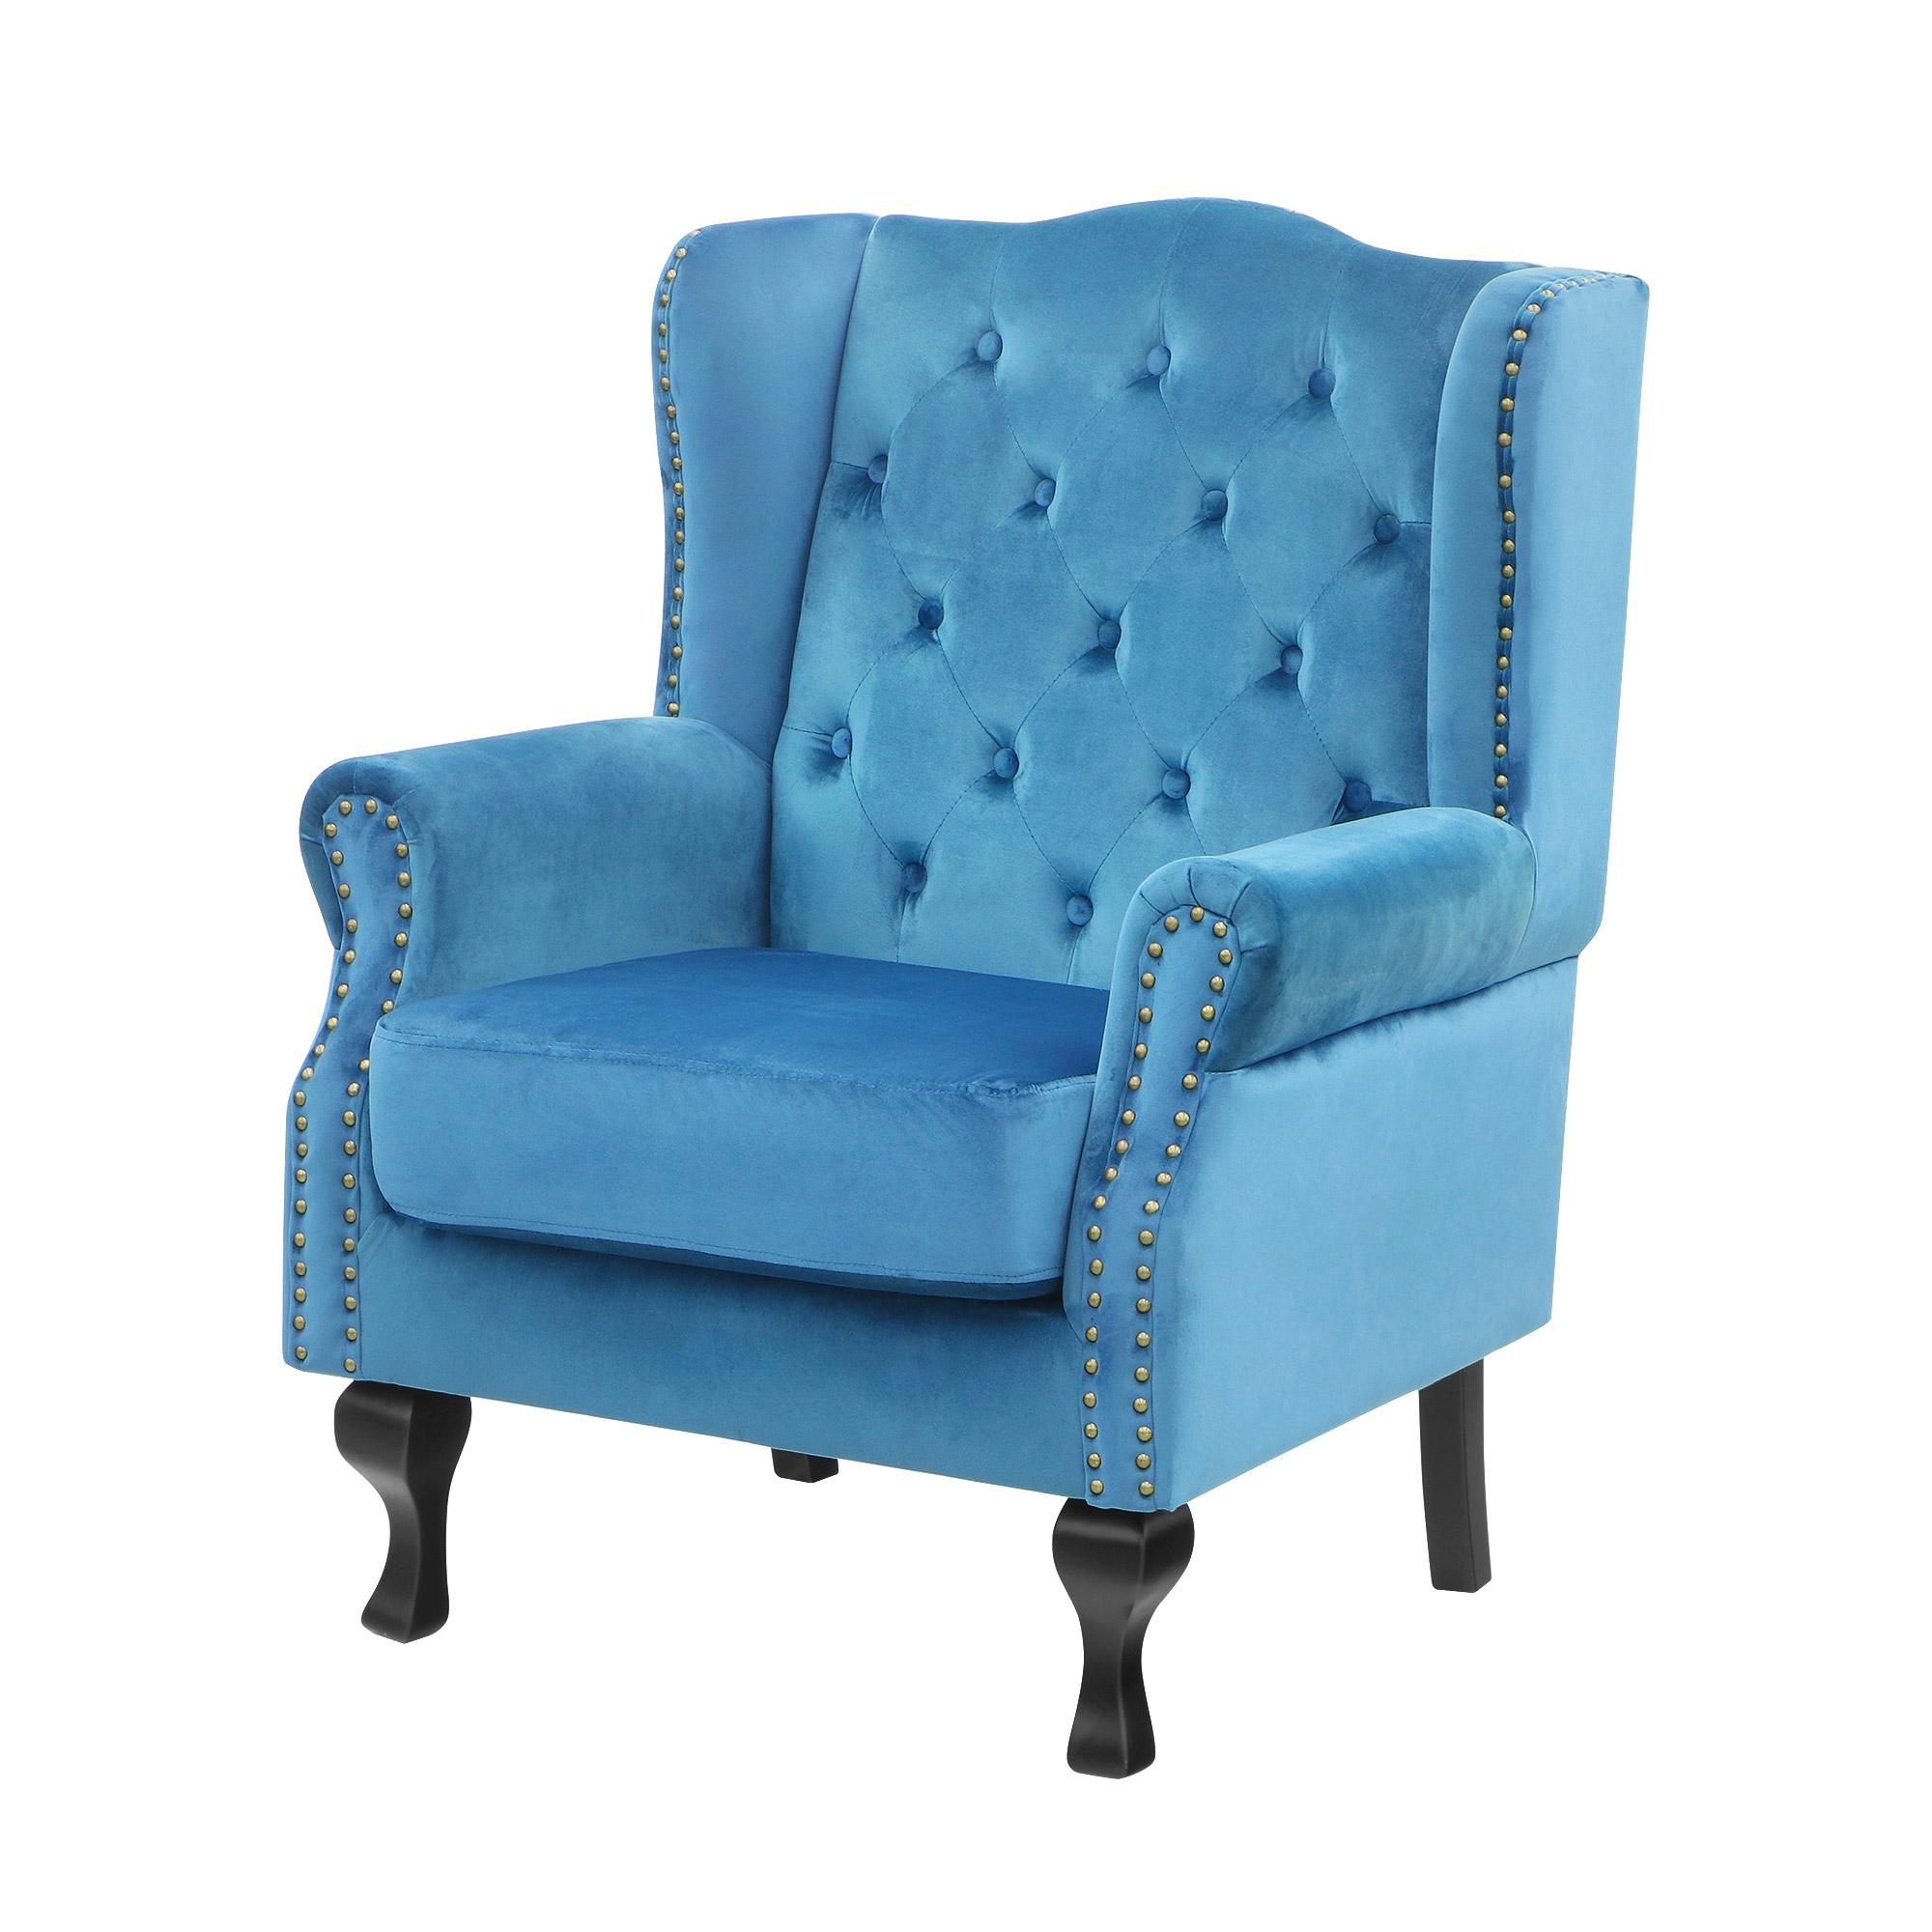 Кресло Deko 81х76х102 с подушками кресло deko 66х66х80 см